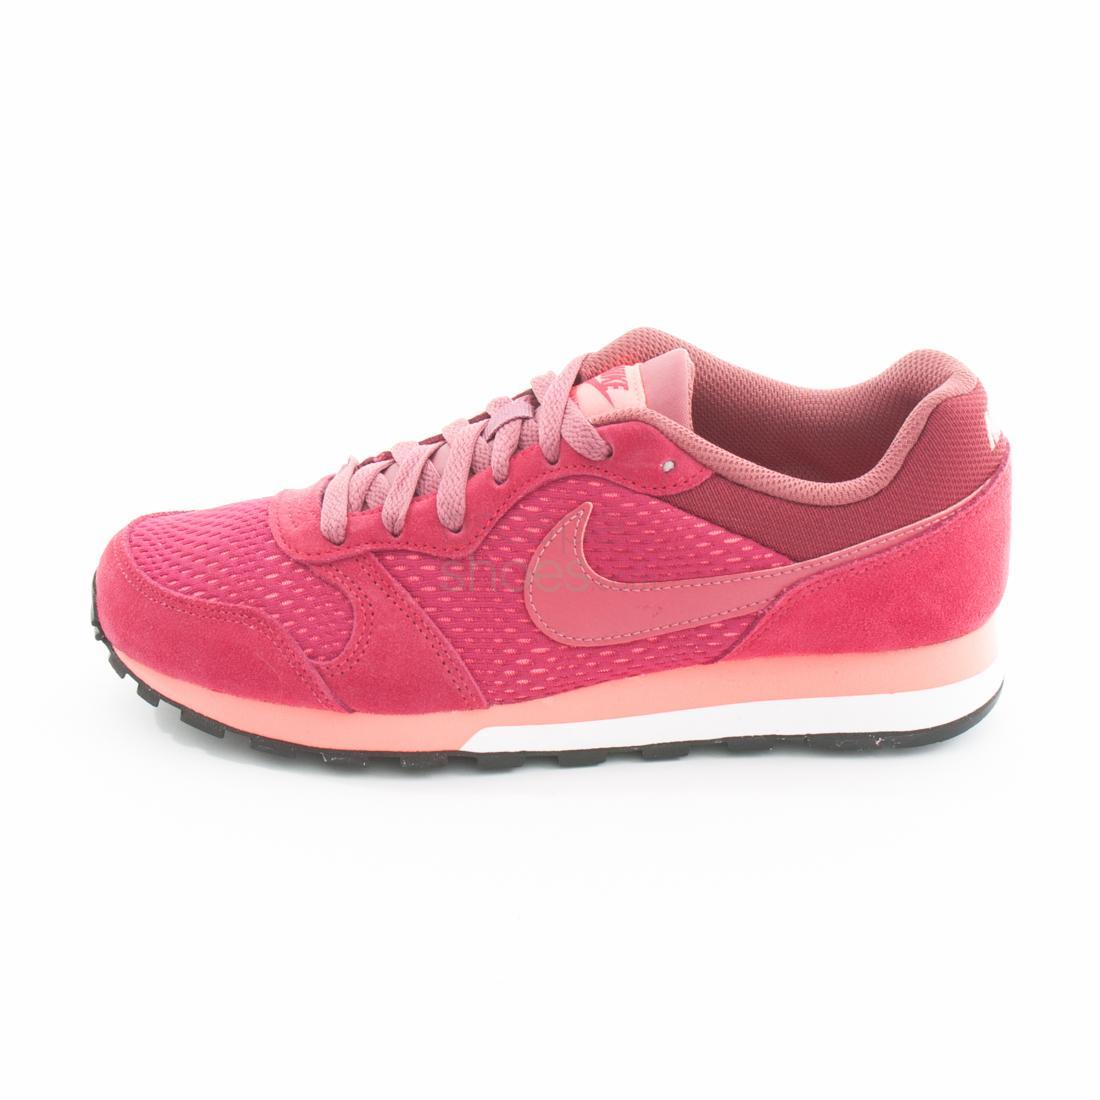 obispo Independiente Enfriarse  Sneakers NIKE MD Runner 2 Noble Red Port 749869 601